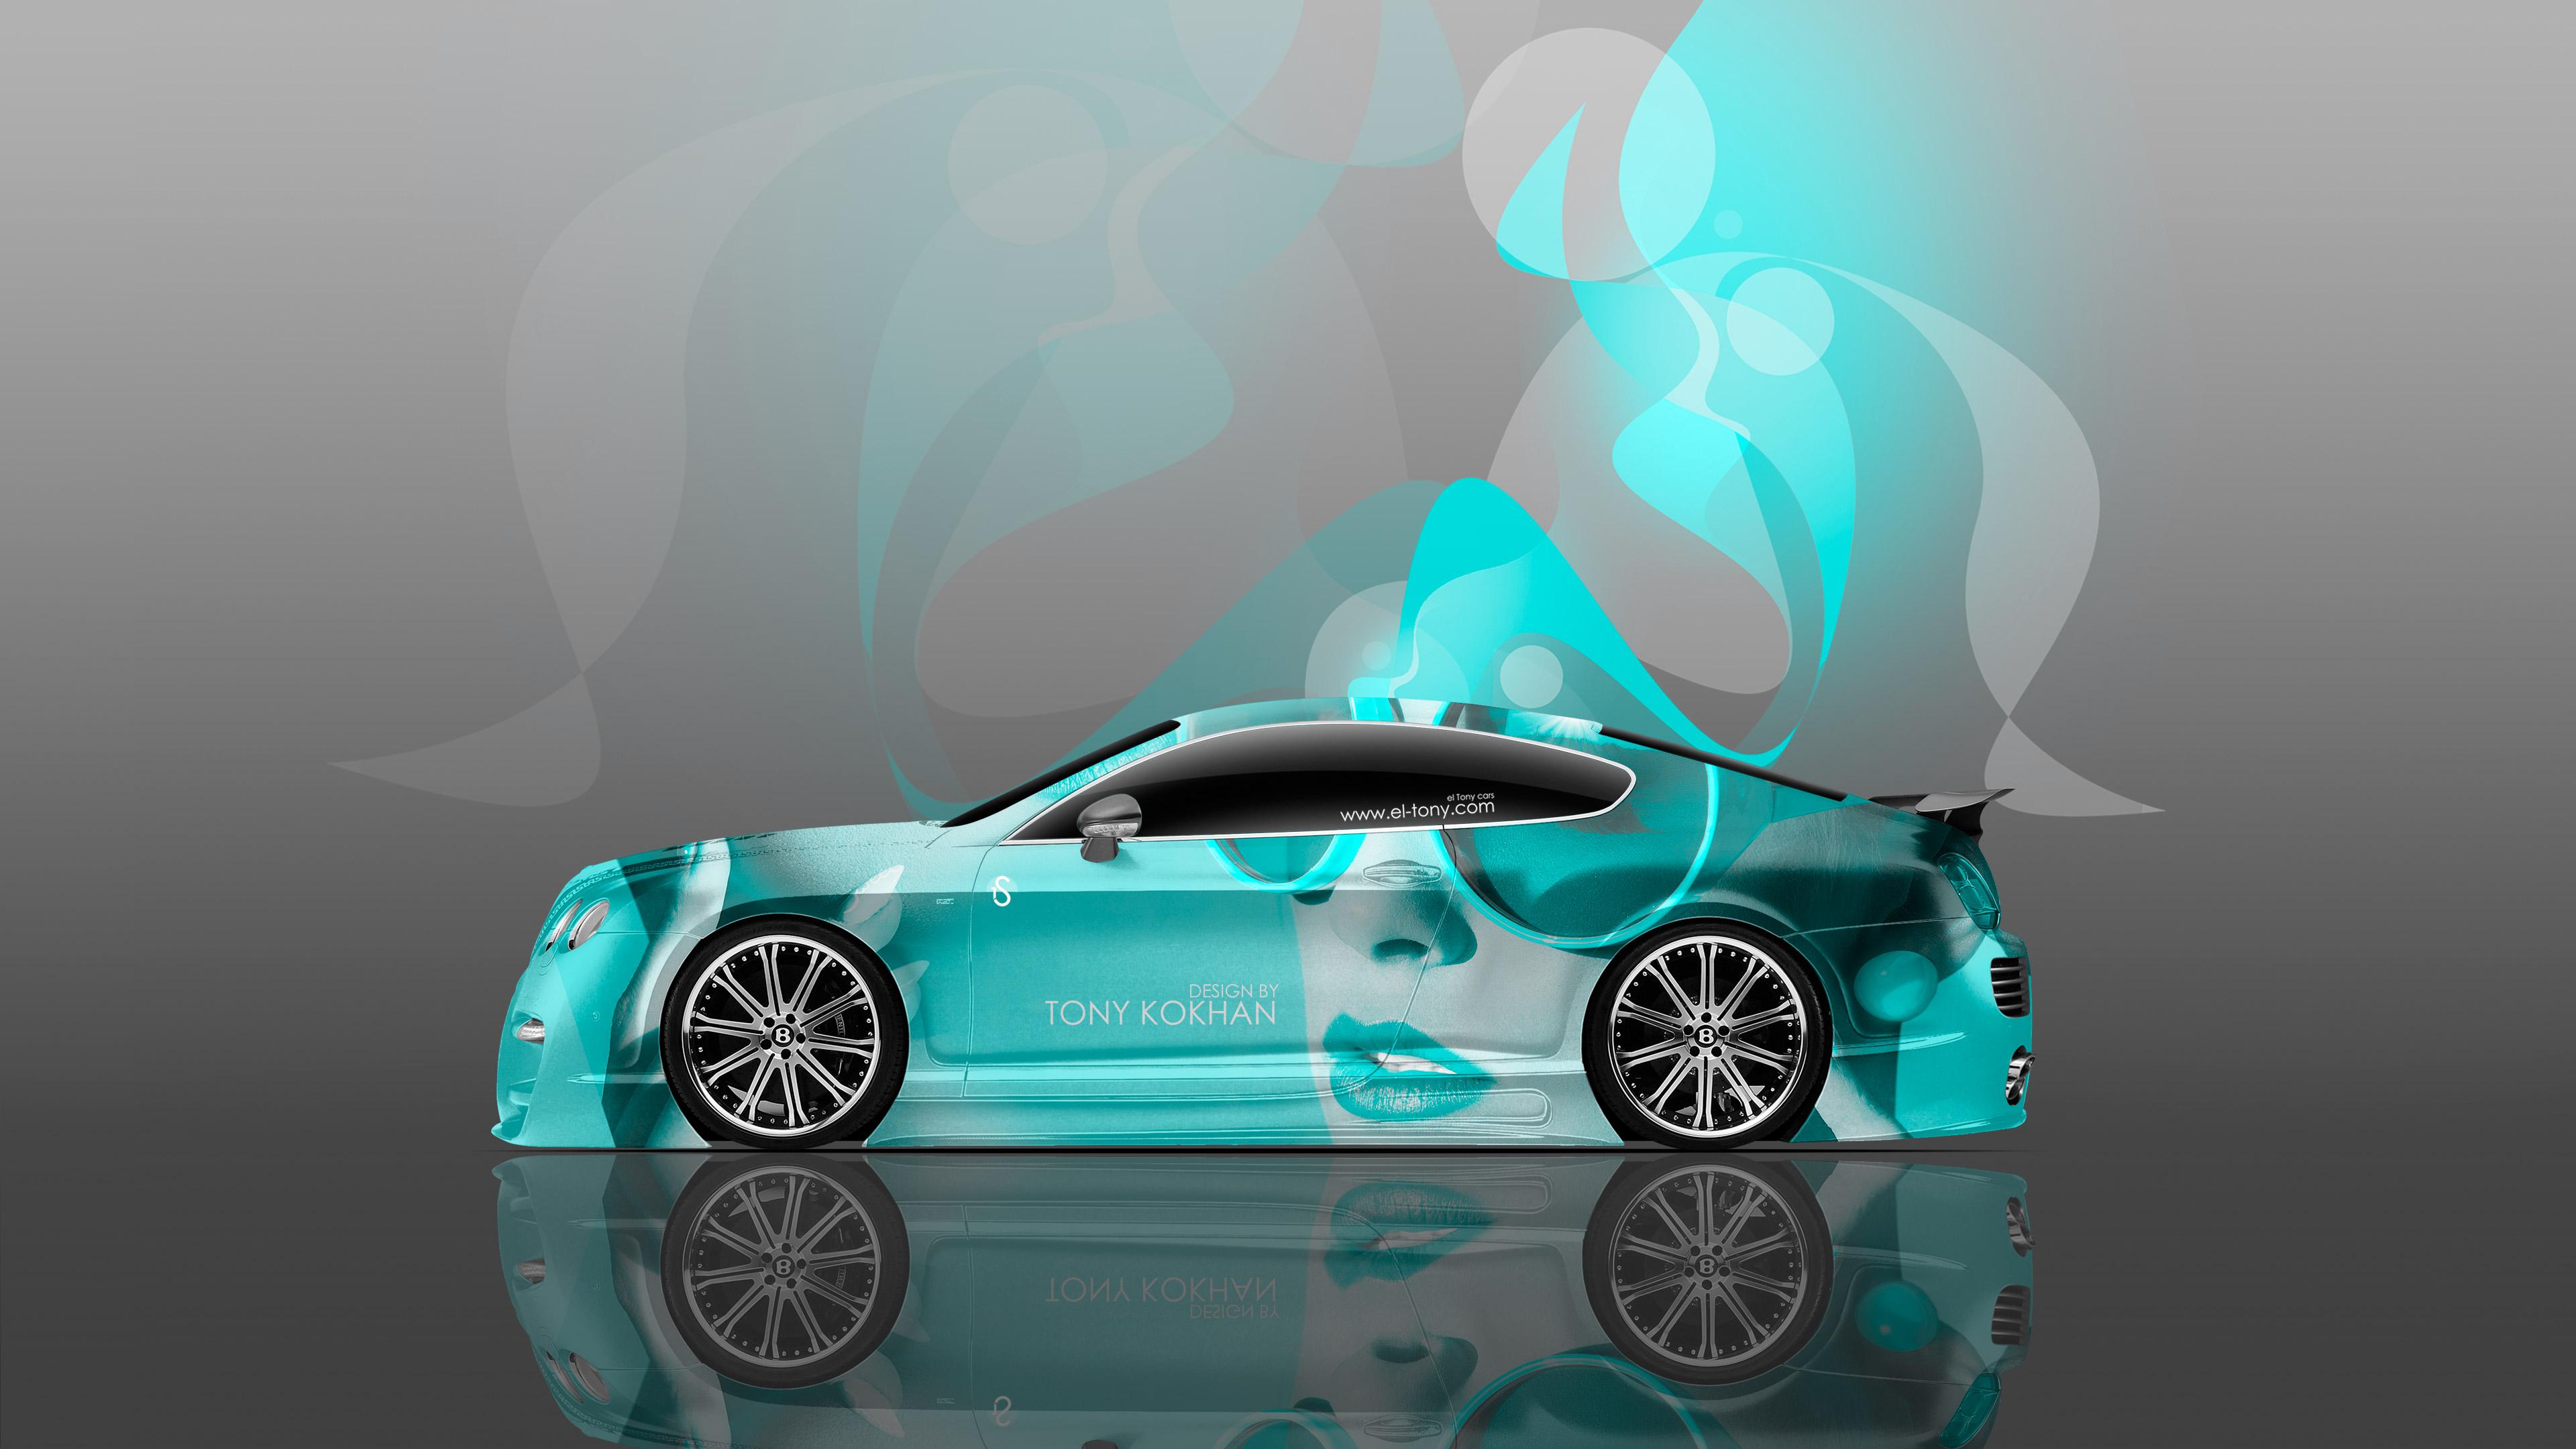 4k car wallpaper Car Pictures 3840x2160